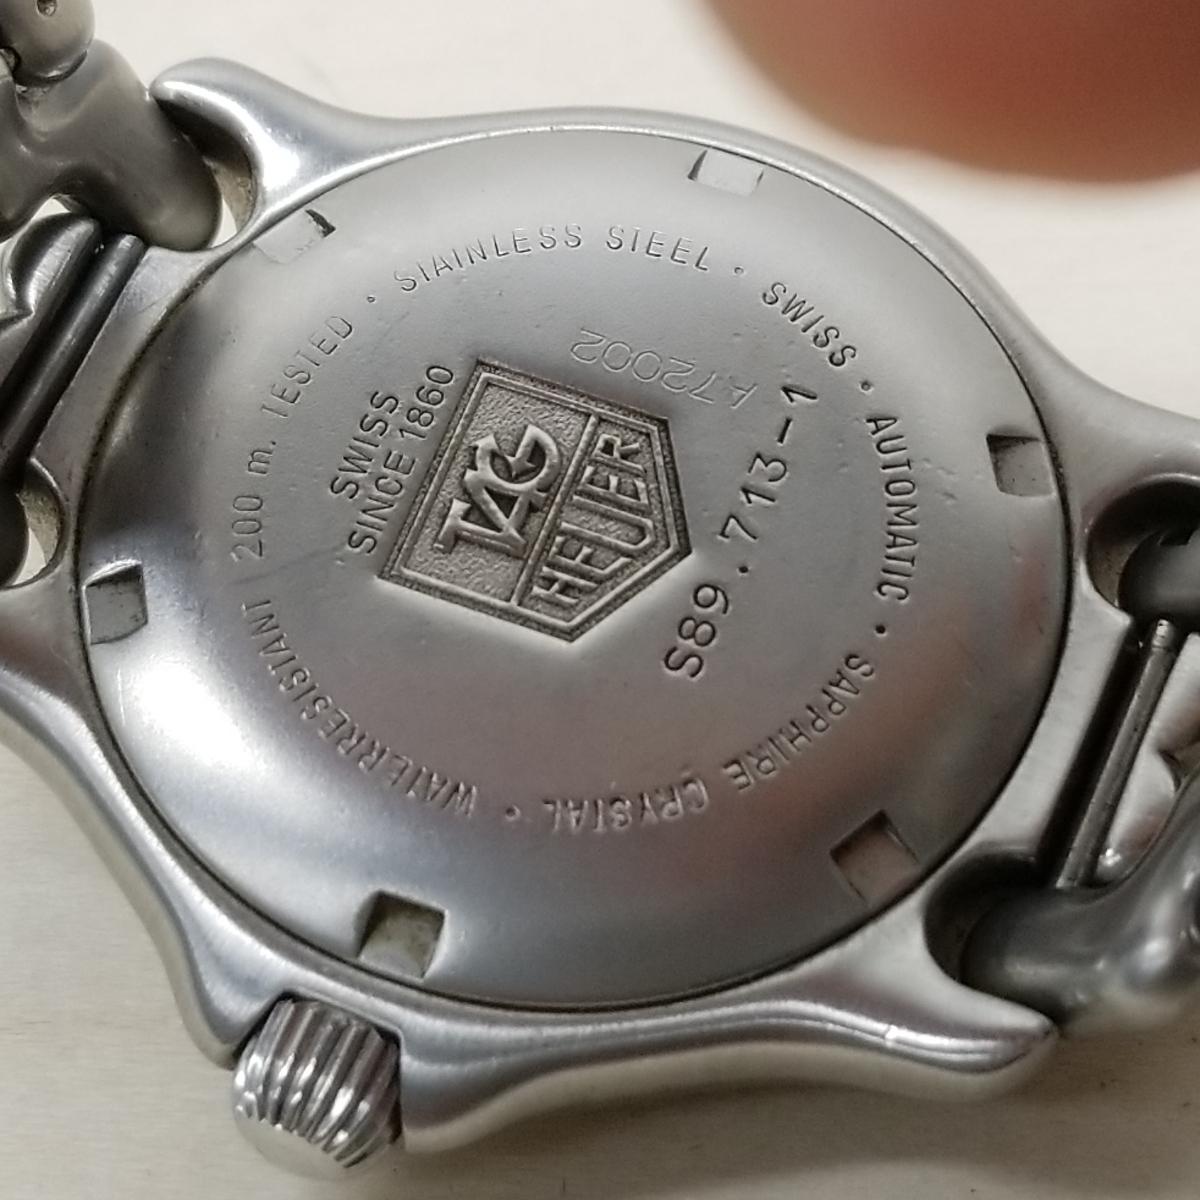 【9】TAG Heuer タグホイヤー セル 200m 自動巻き S89.713-1 稼動品_画像8